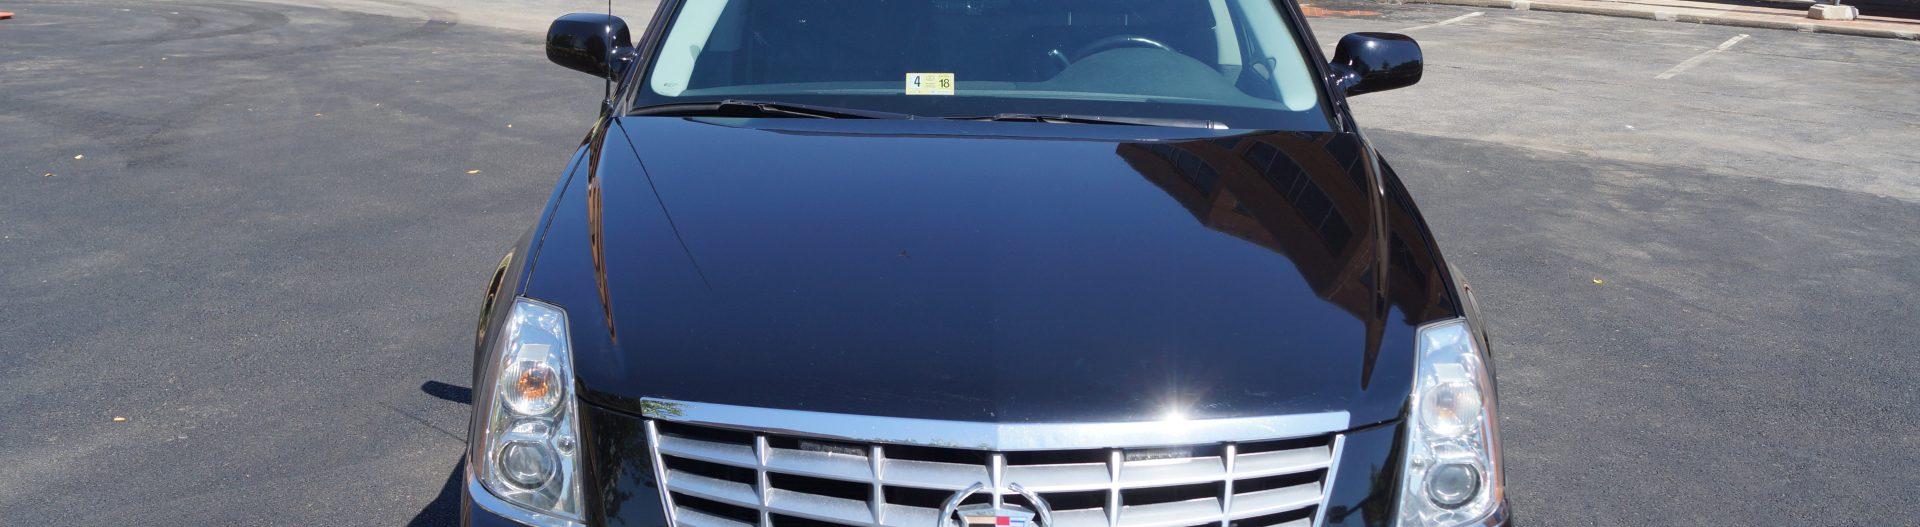 2011 Cadillac Heritage Hearse